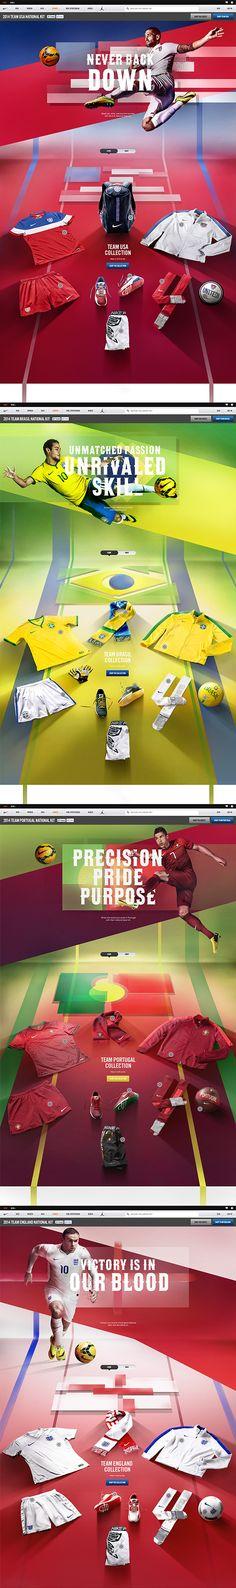 Nike National Team Kits 2014 on Web Design Served